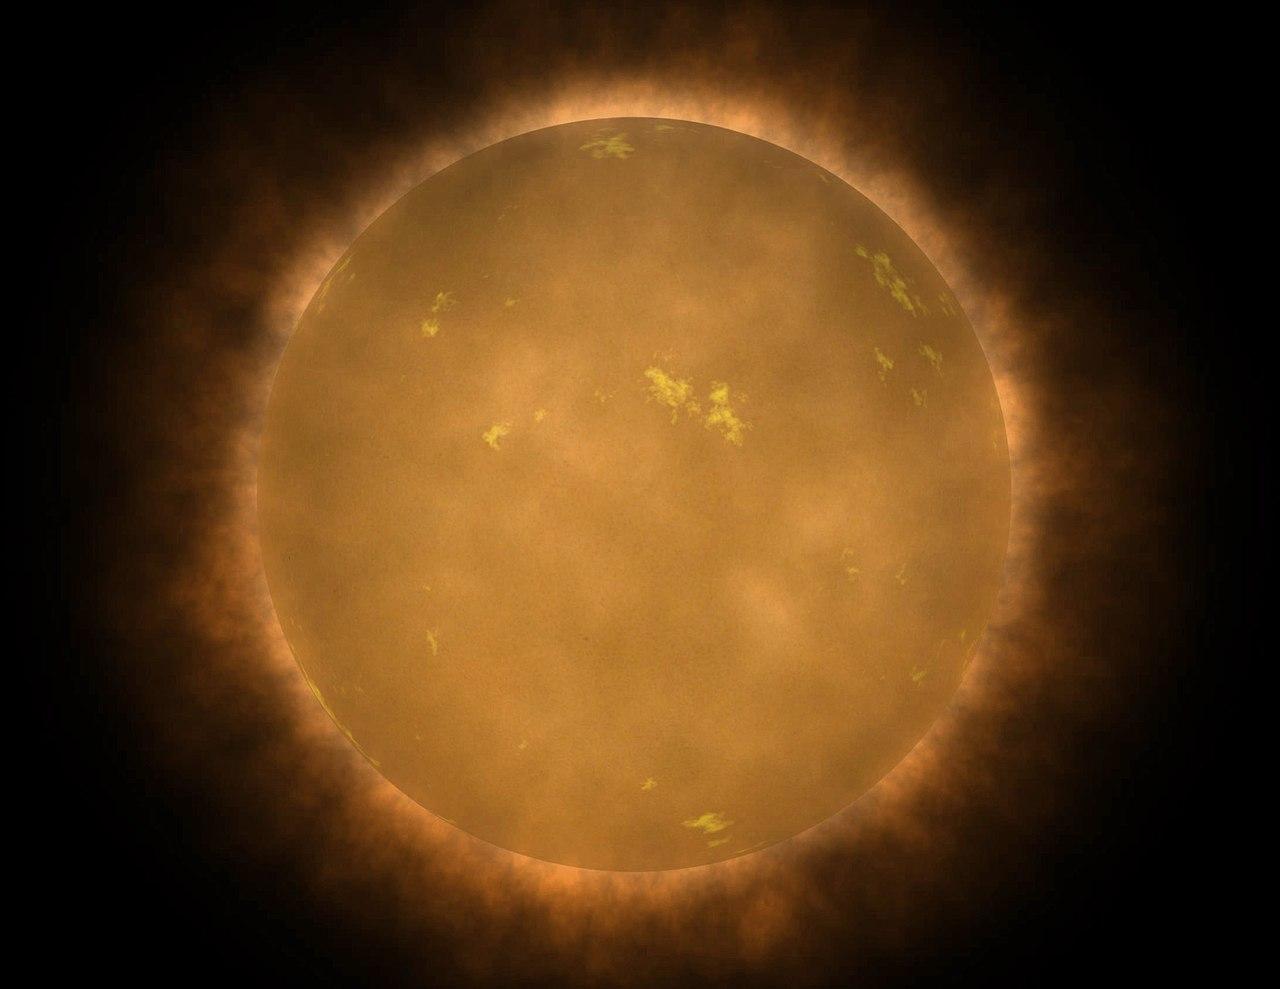 Artist's conception ของดาวแคระแดง ซึ่งดาวประเภทนี้พบอยู่มากที่สุดในย่านดาวฤกษ์ัทั้งหมด